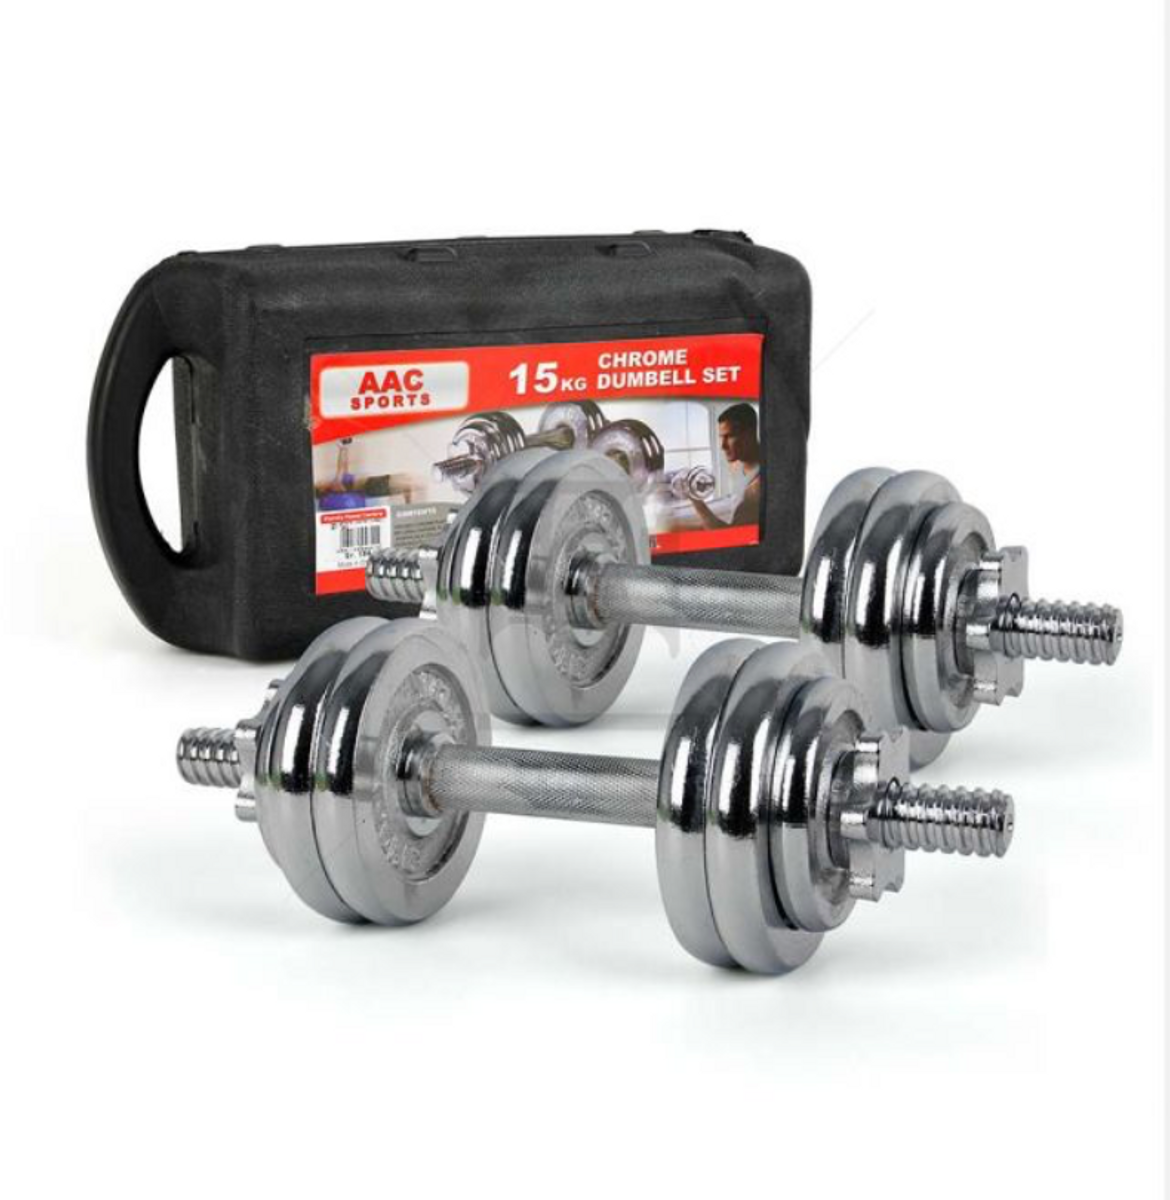 PowerGym adjustable dumbbell set 15kg